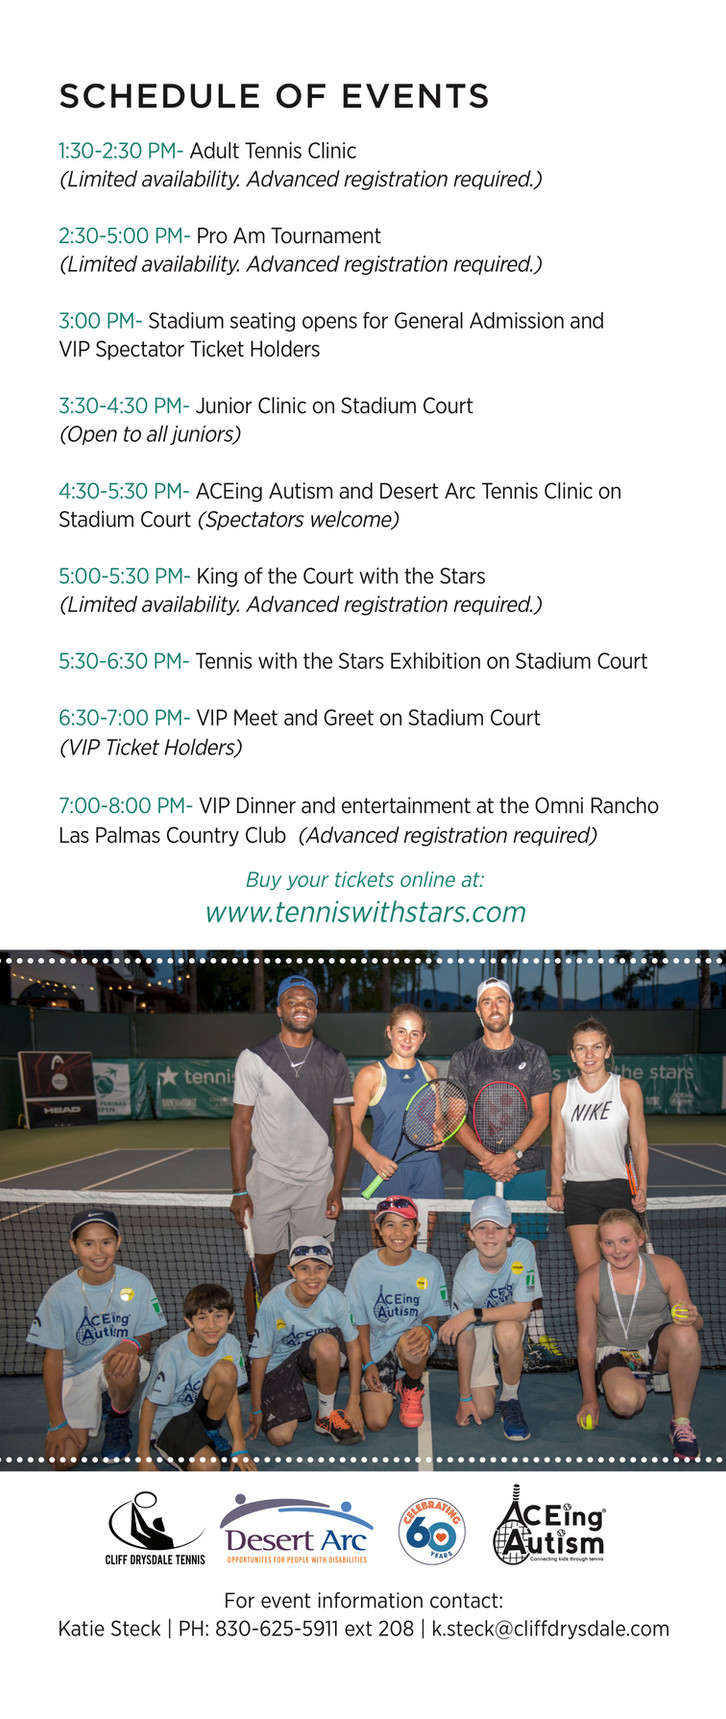 Calendario de eventos de tenis